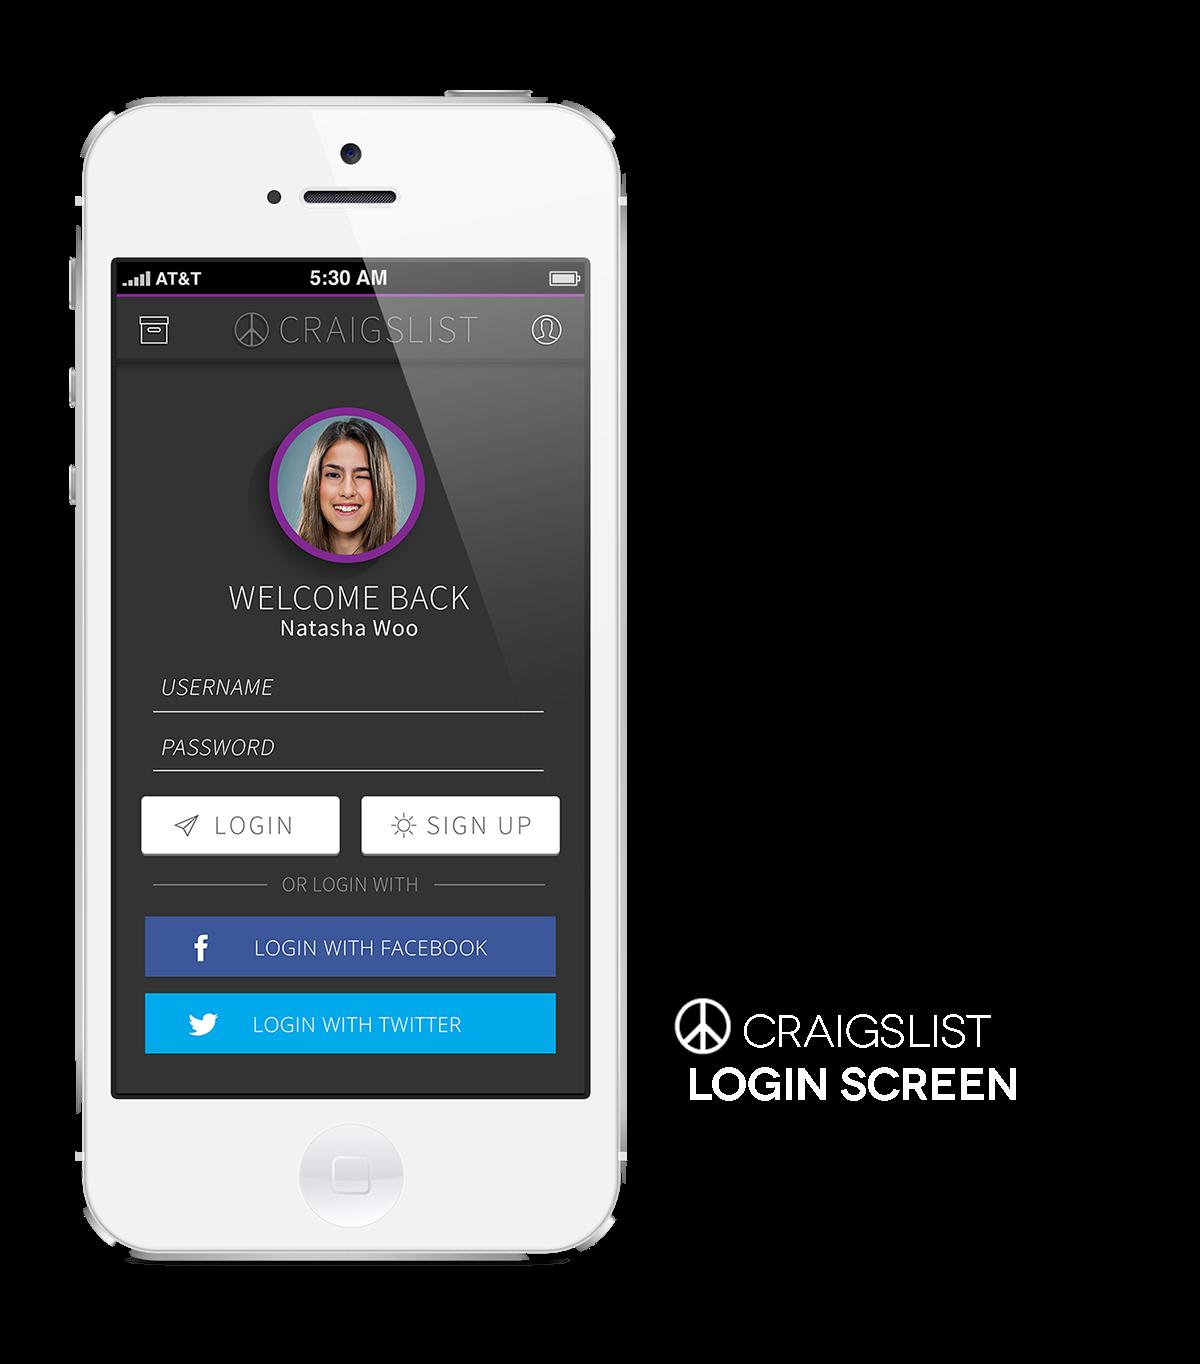 Craigslist App Concept Design on Behance